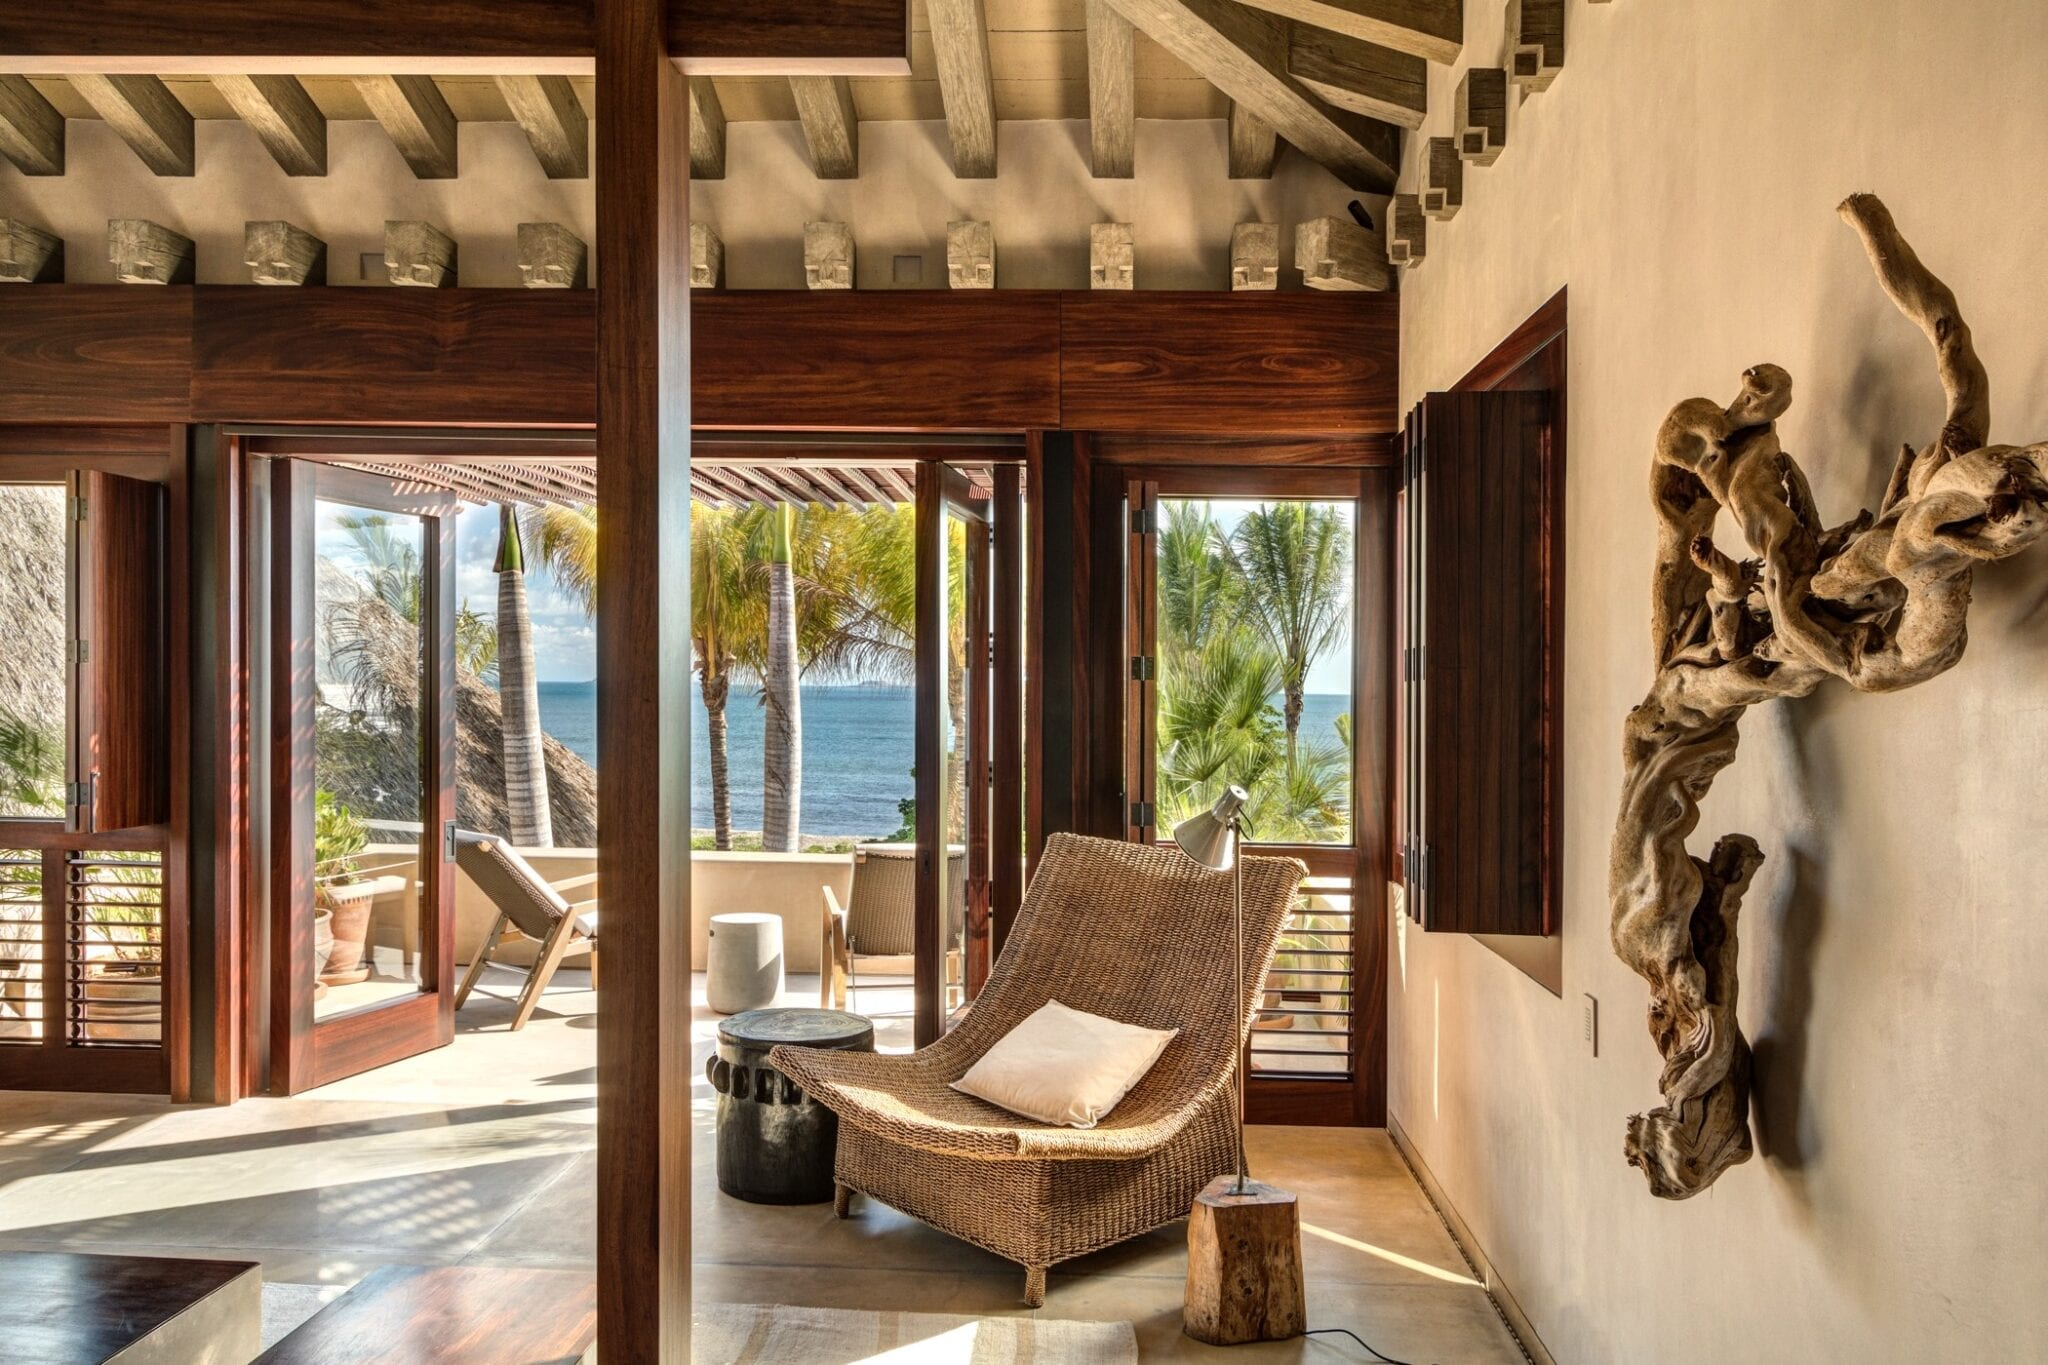 Casa Koko Luna Master Suite View To Balcony